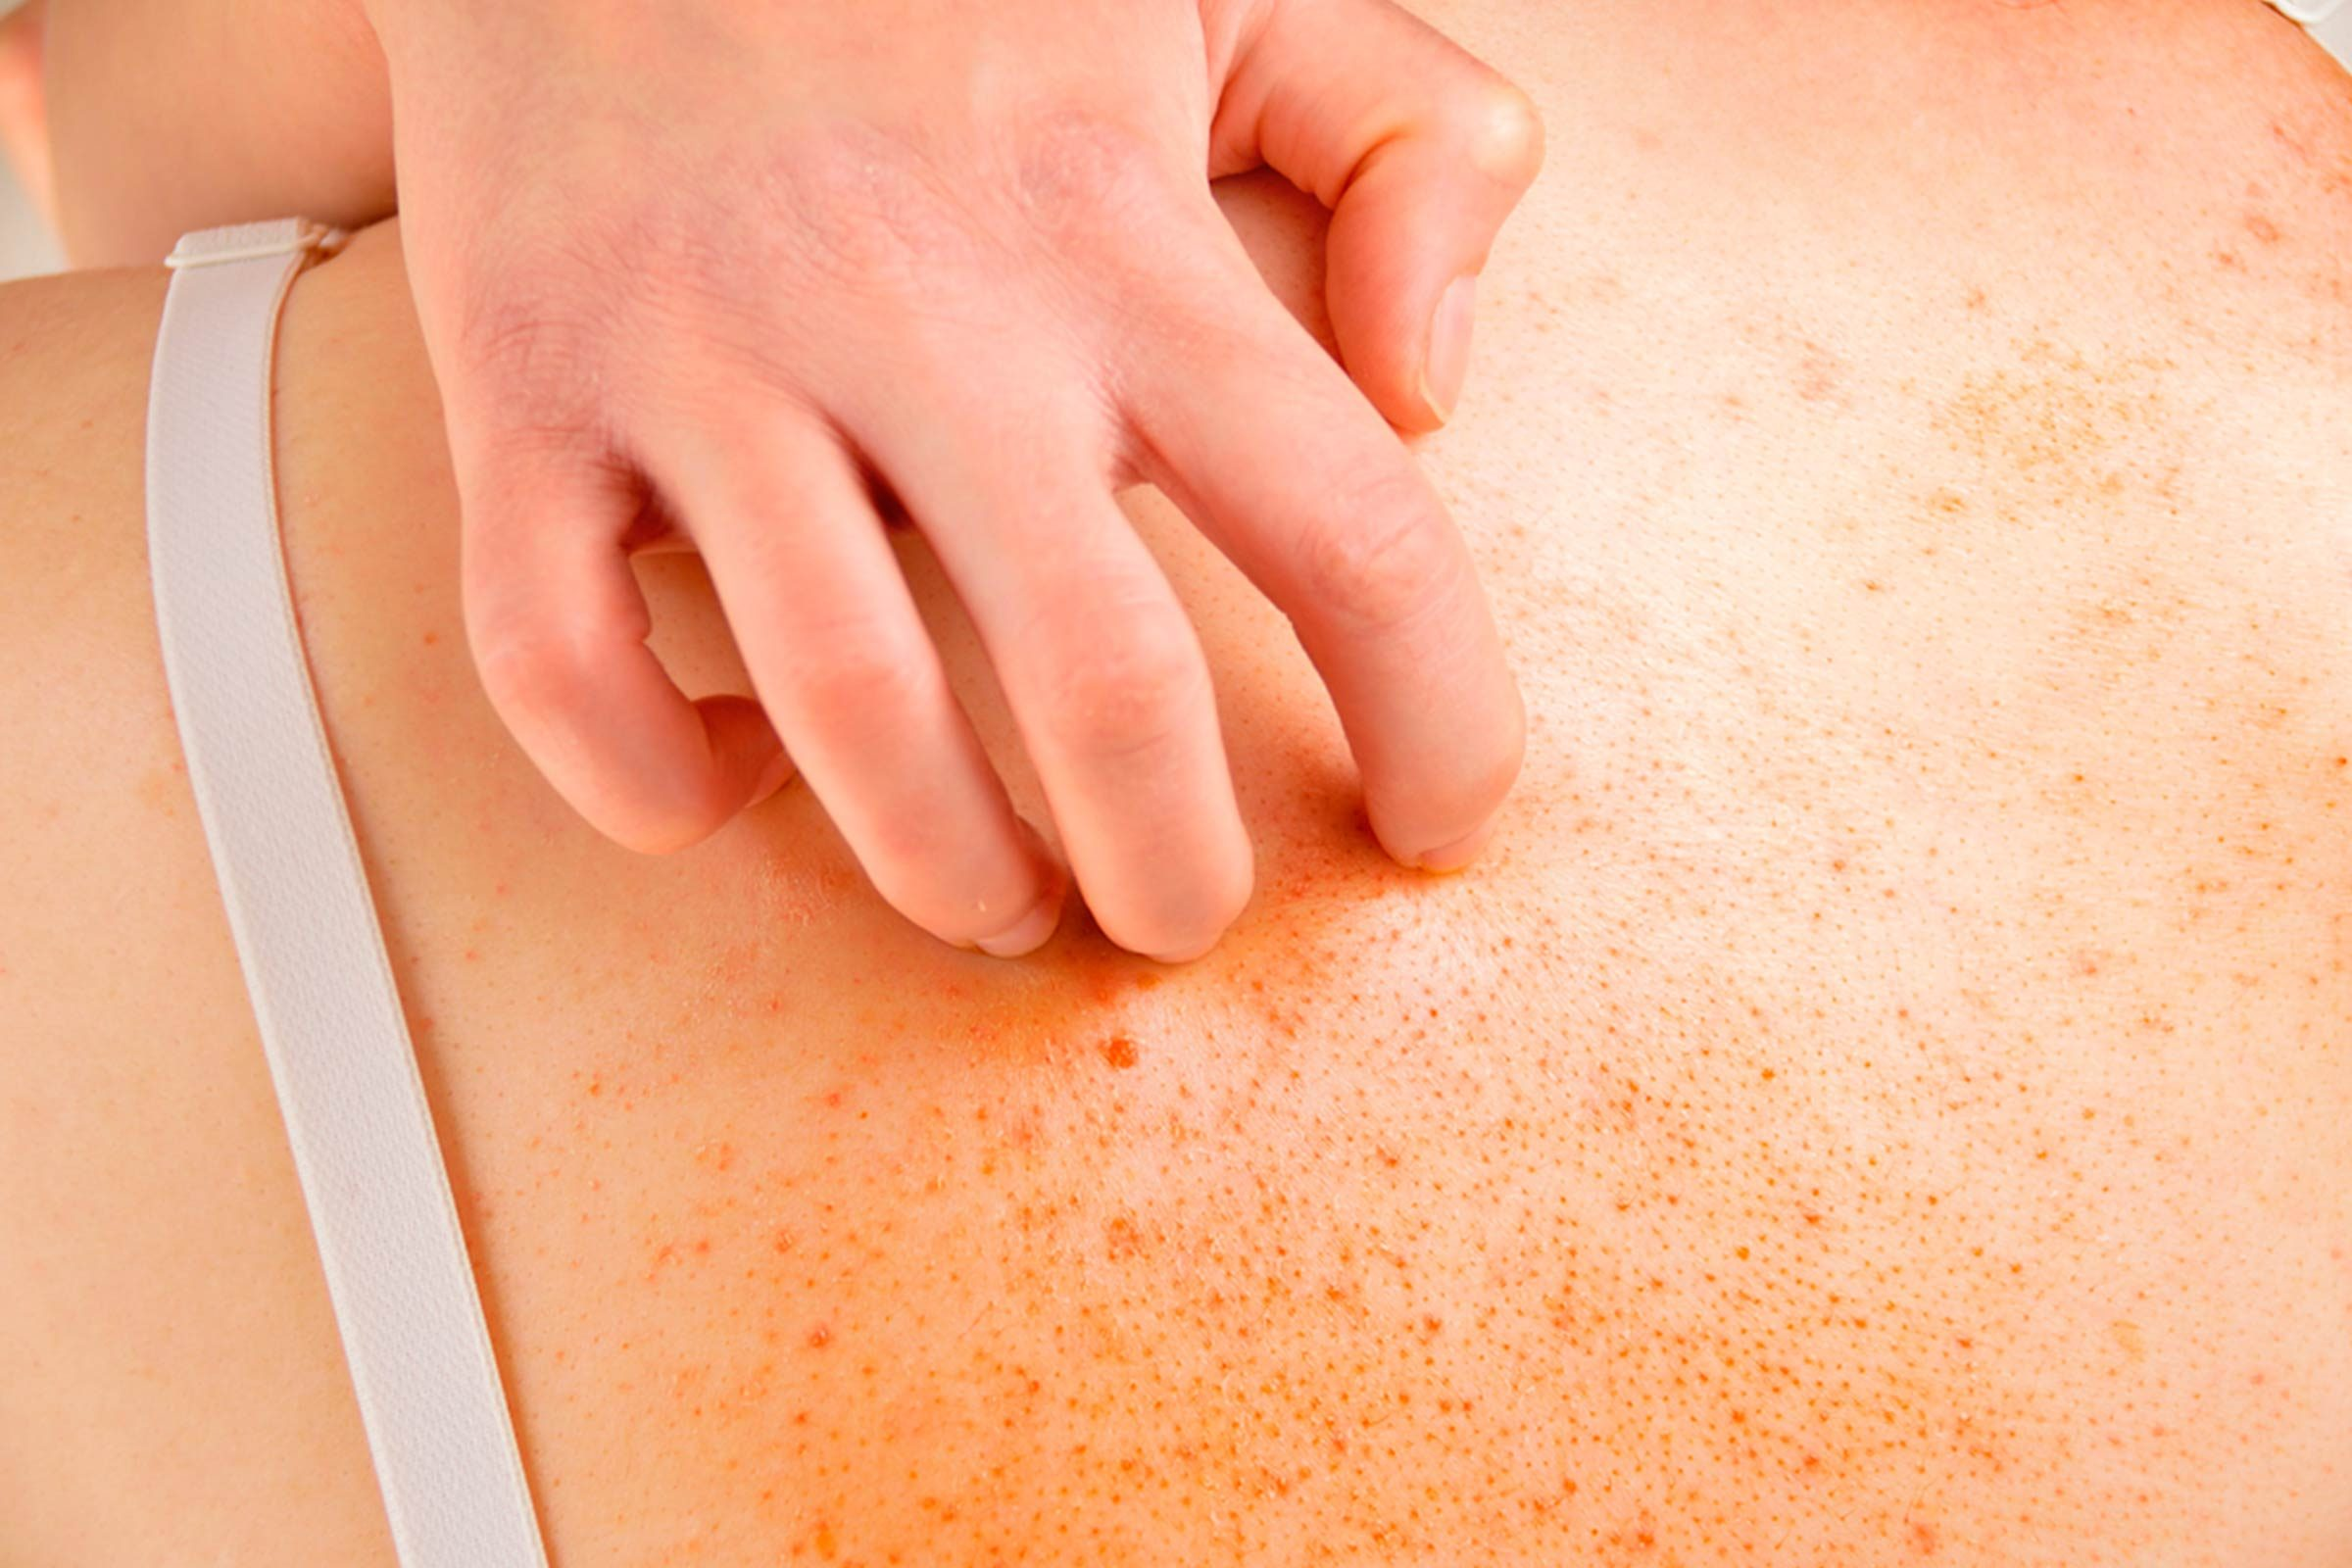 hand scratching skin